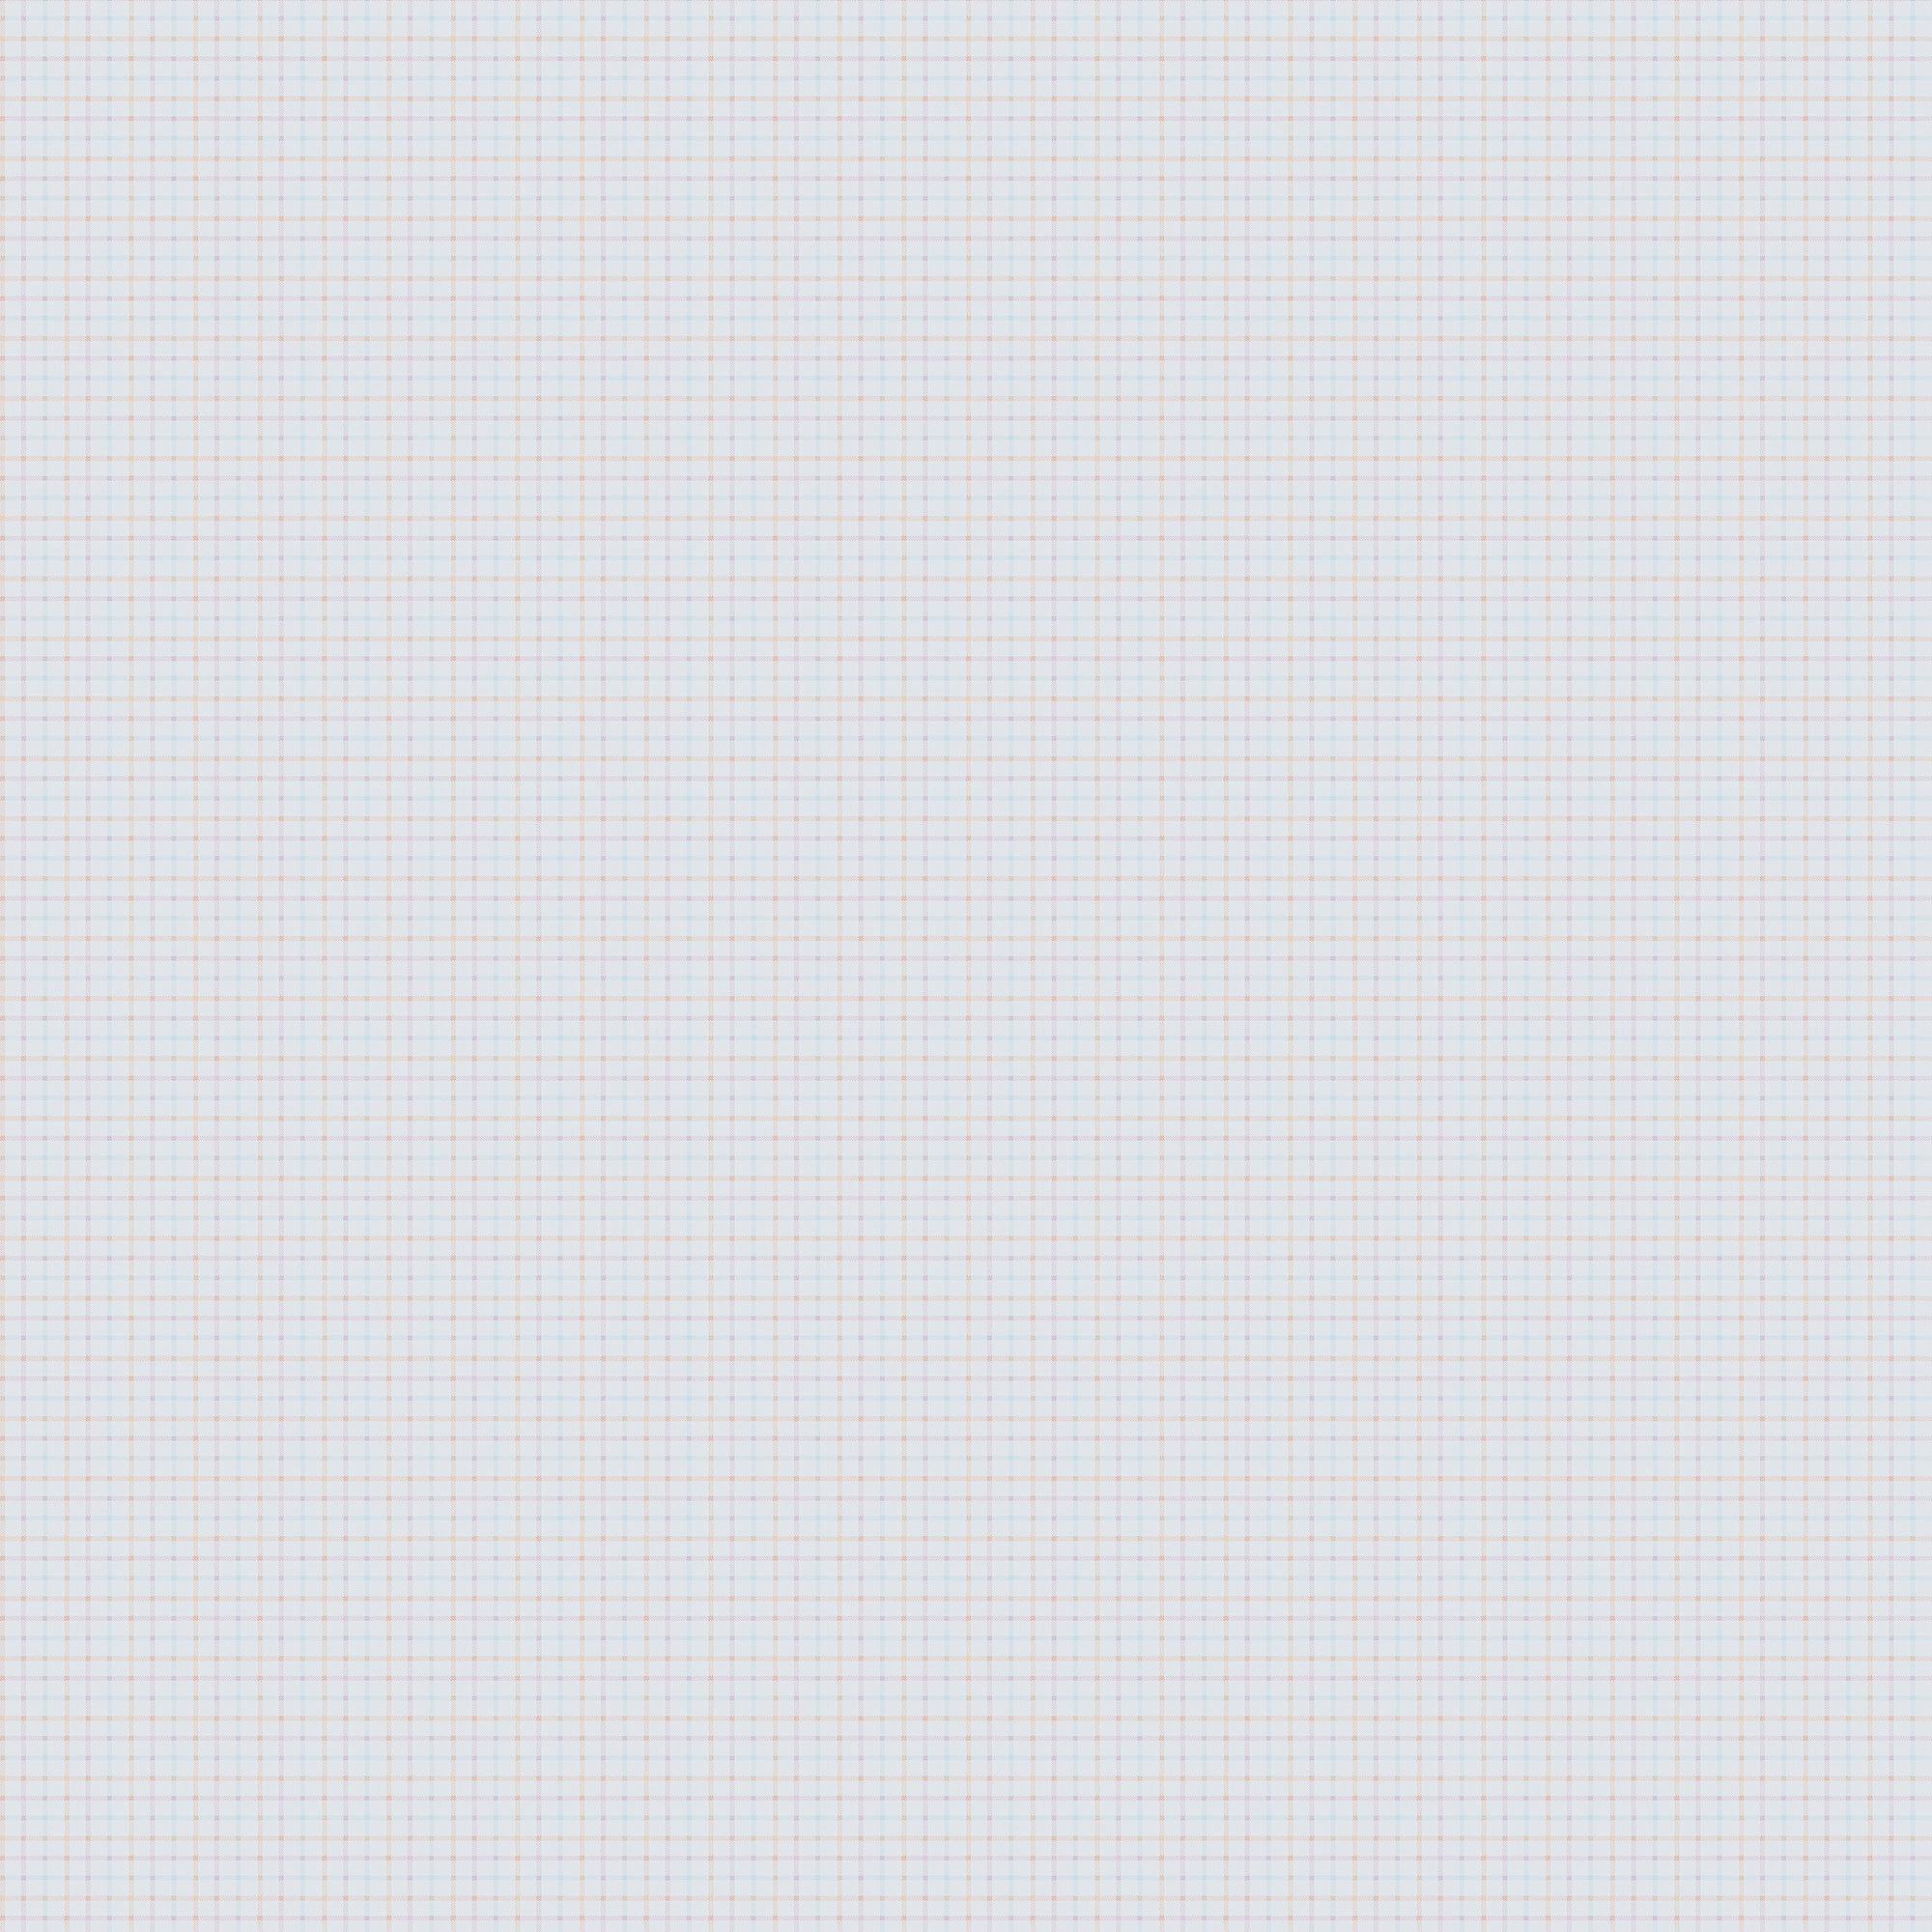 Шведские обои Sandberg,  коллекция Engla & Elliot, артикул764-07